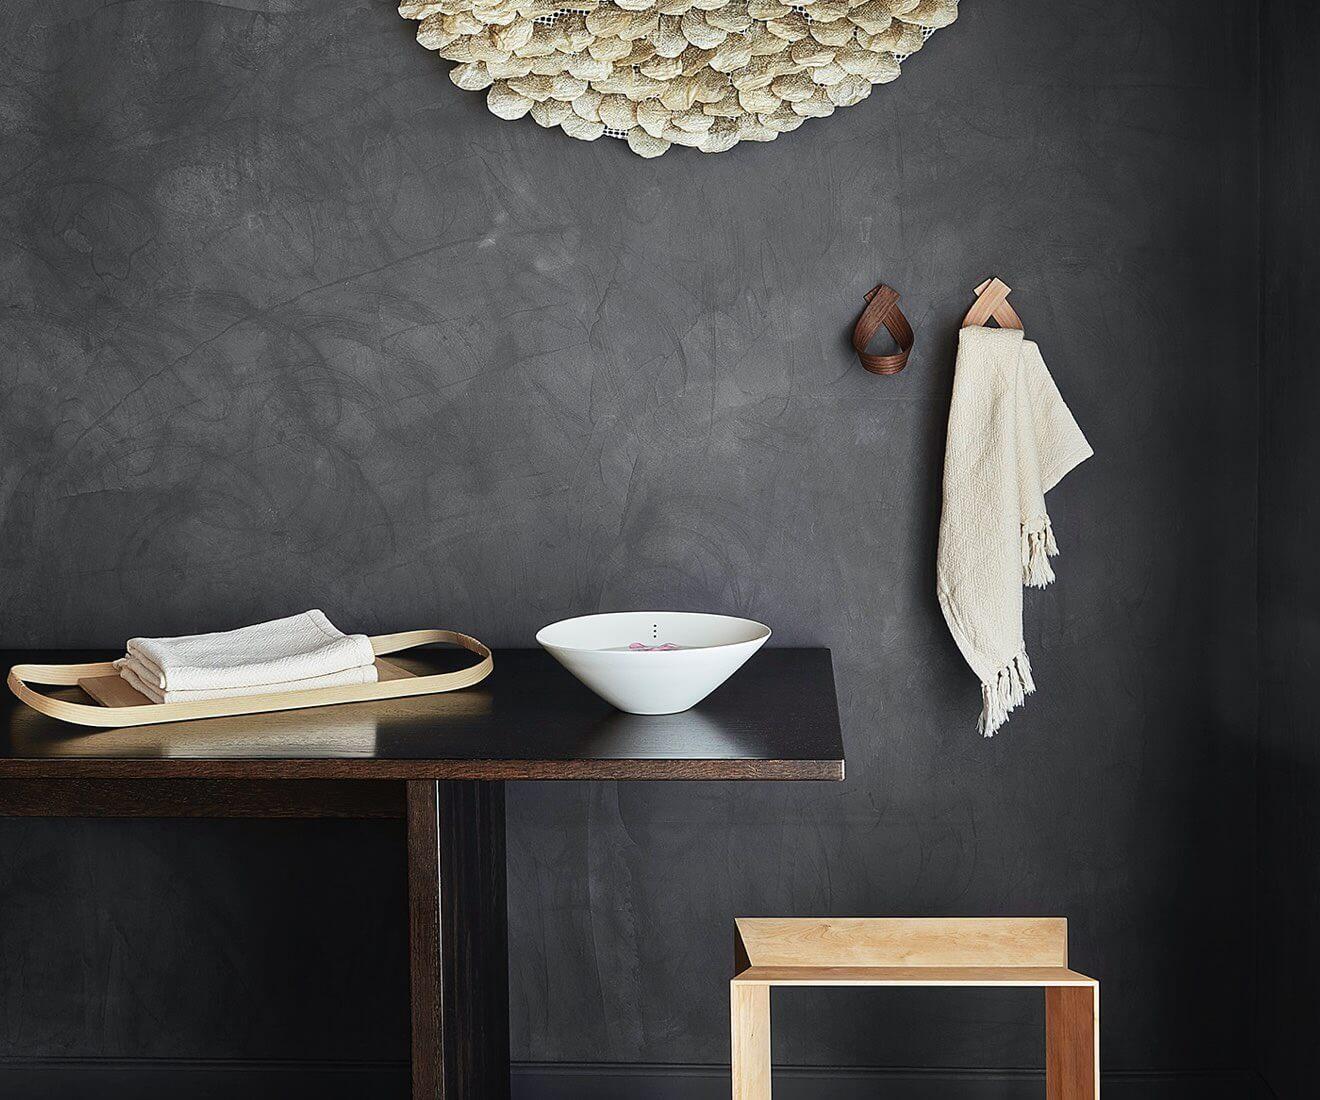 Interior photo of Motarasu designs - Ribbon coat hooks, walnut and beech, by Akiko Ken Made - Shiro bowls by Stilleben - Union tray by Masuko Unayama - Reflex stool by Akiko Ken Made